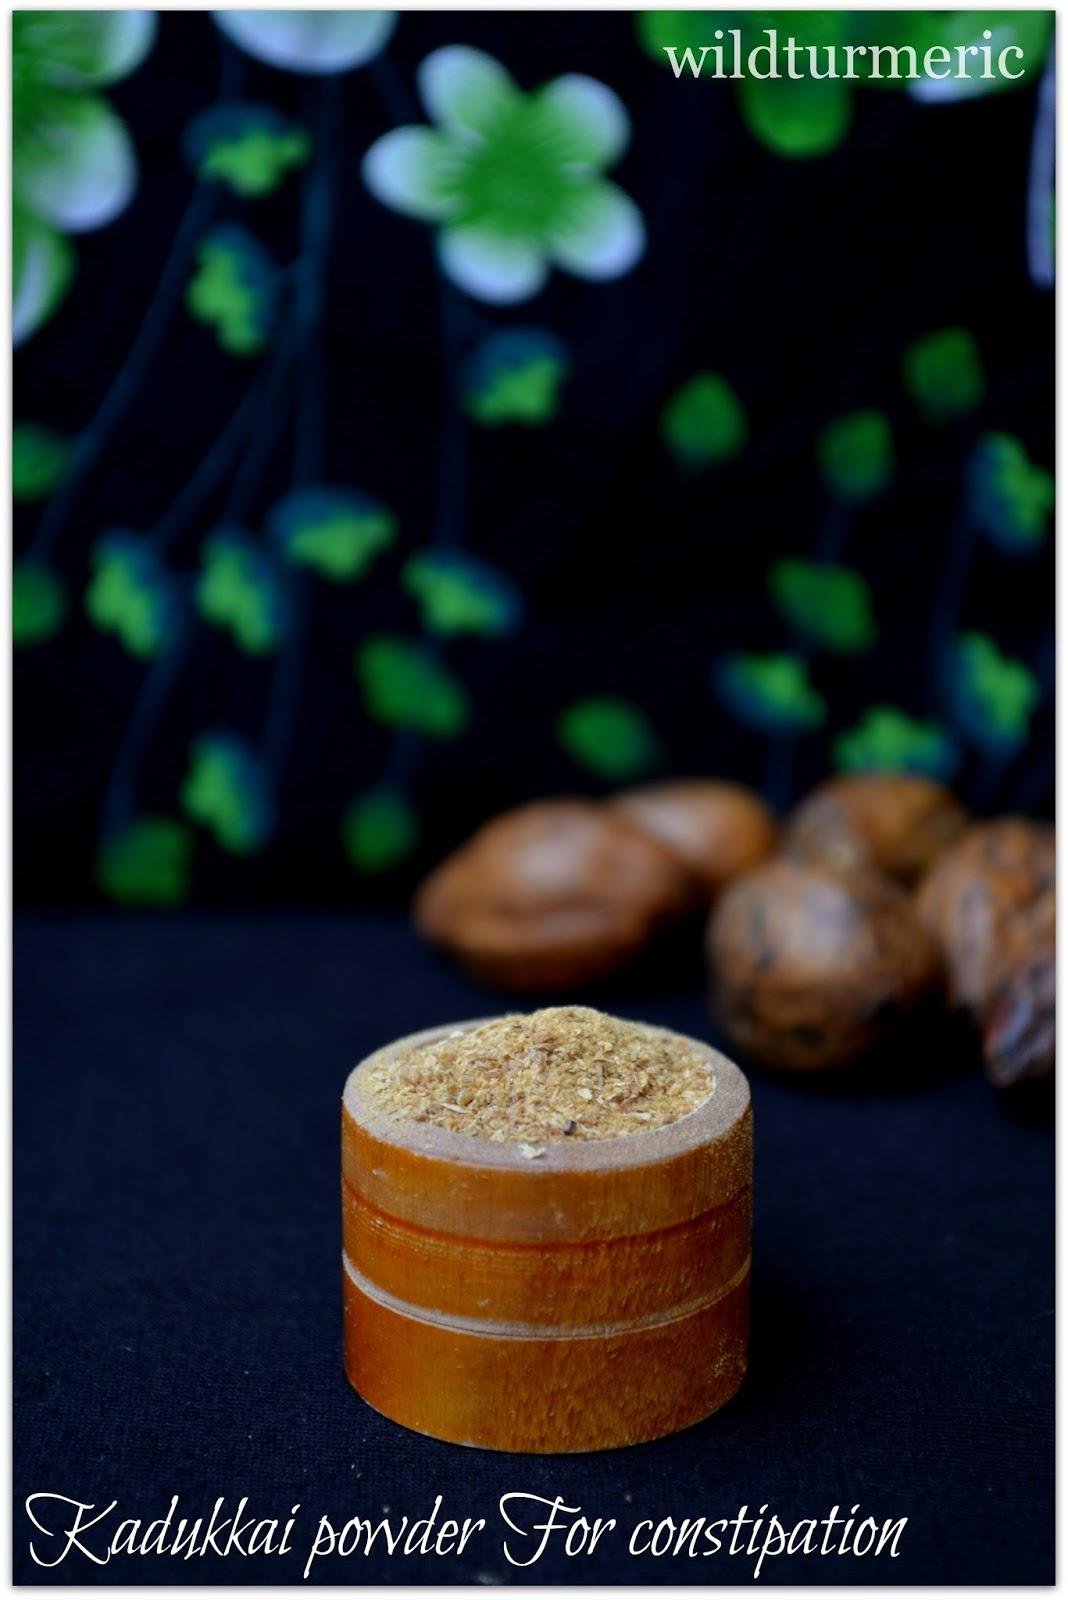 5 Top Benefits, Uses Of Kadukkai Powder (Haritaki Powder) For Skin, Hair & Health!